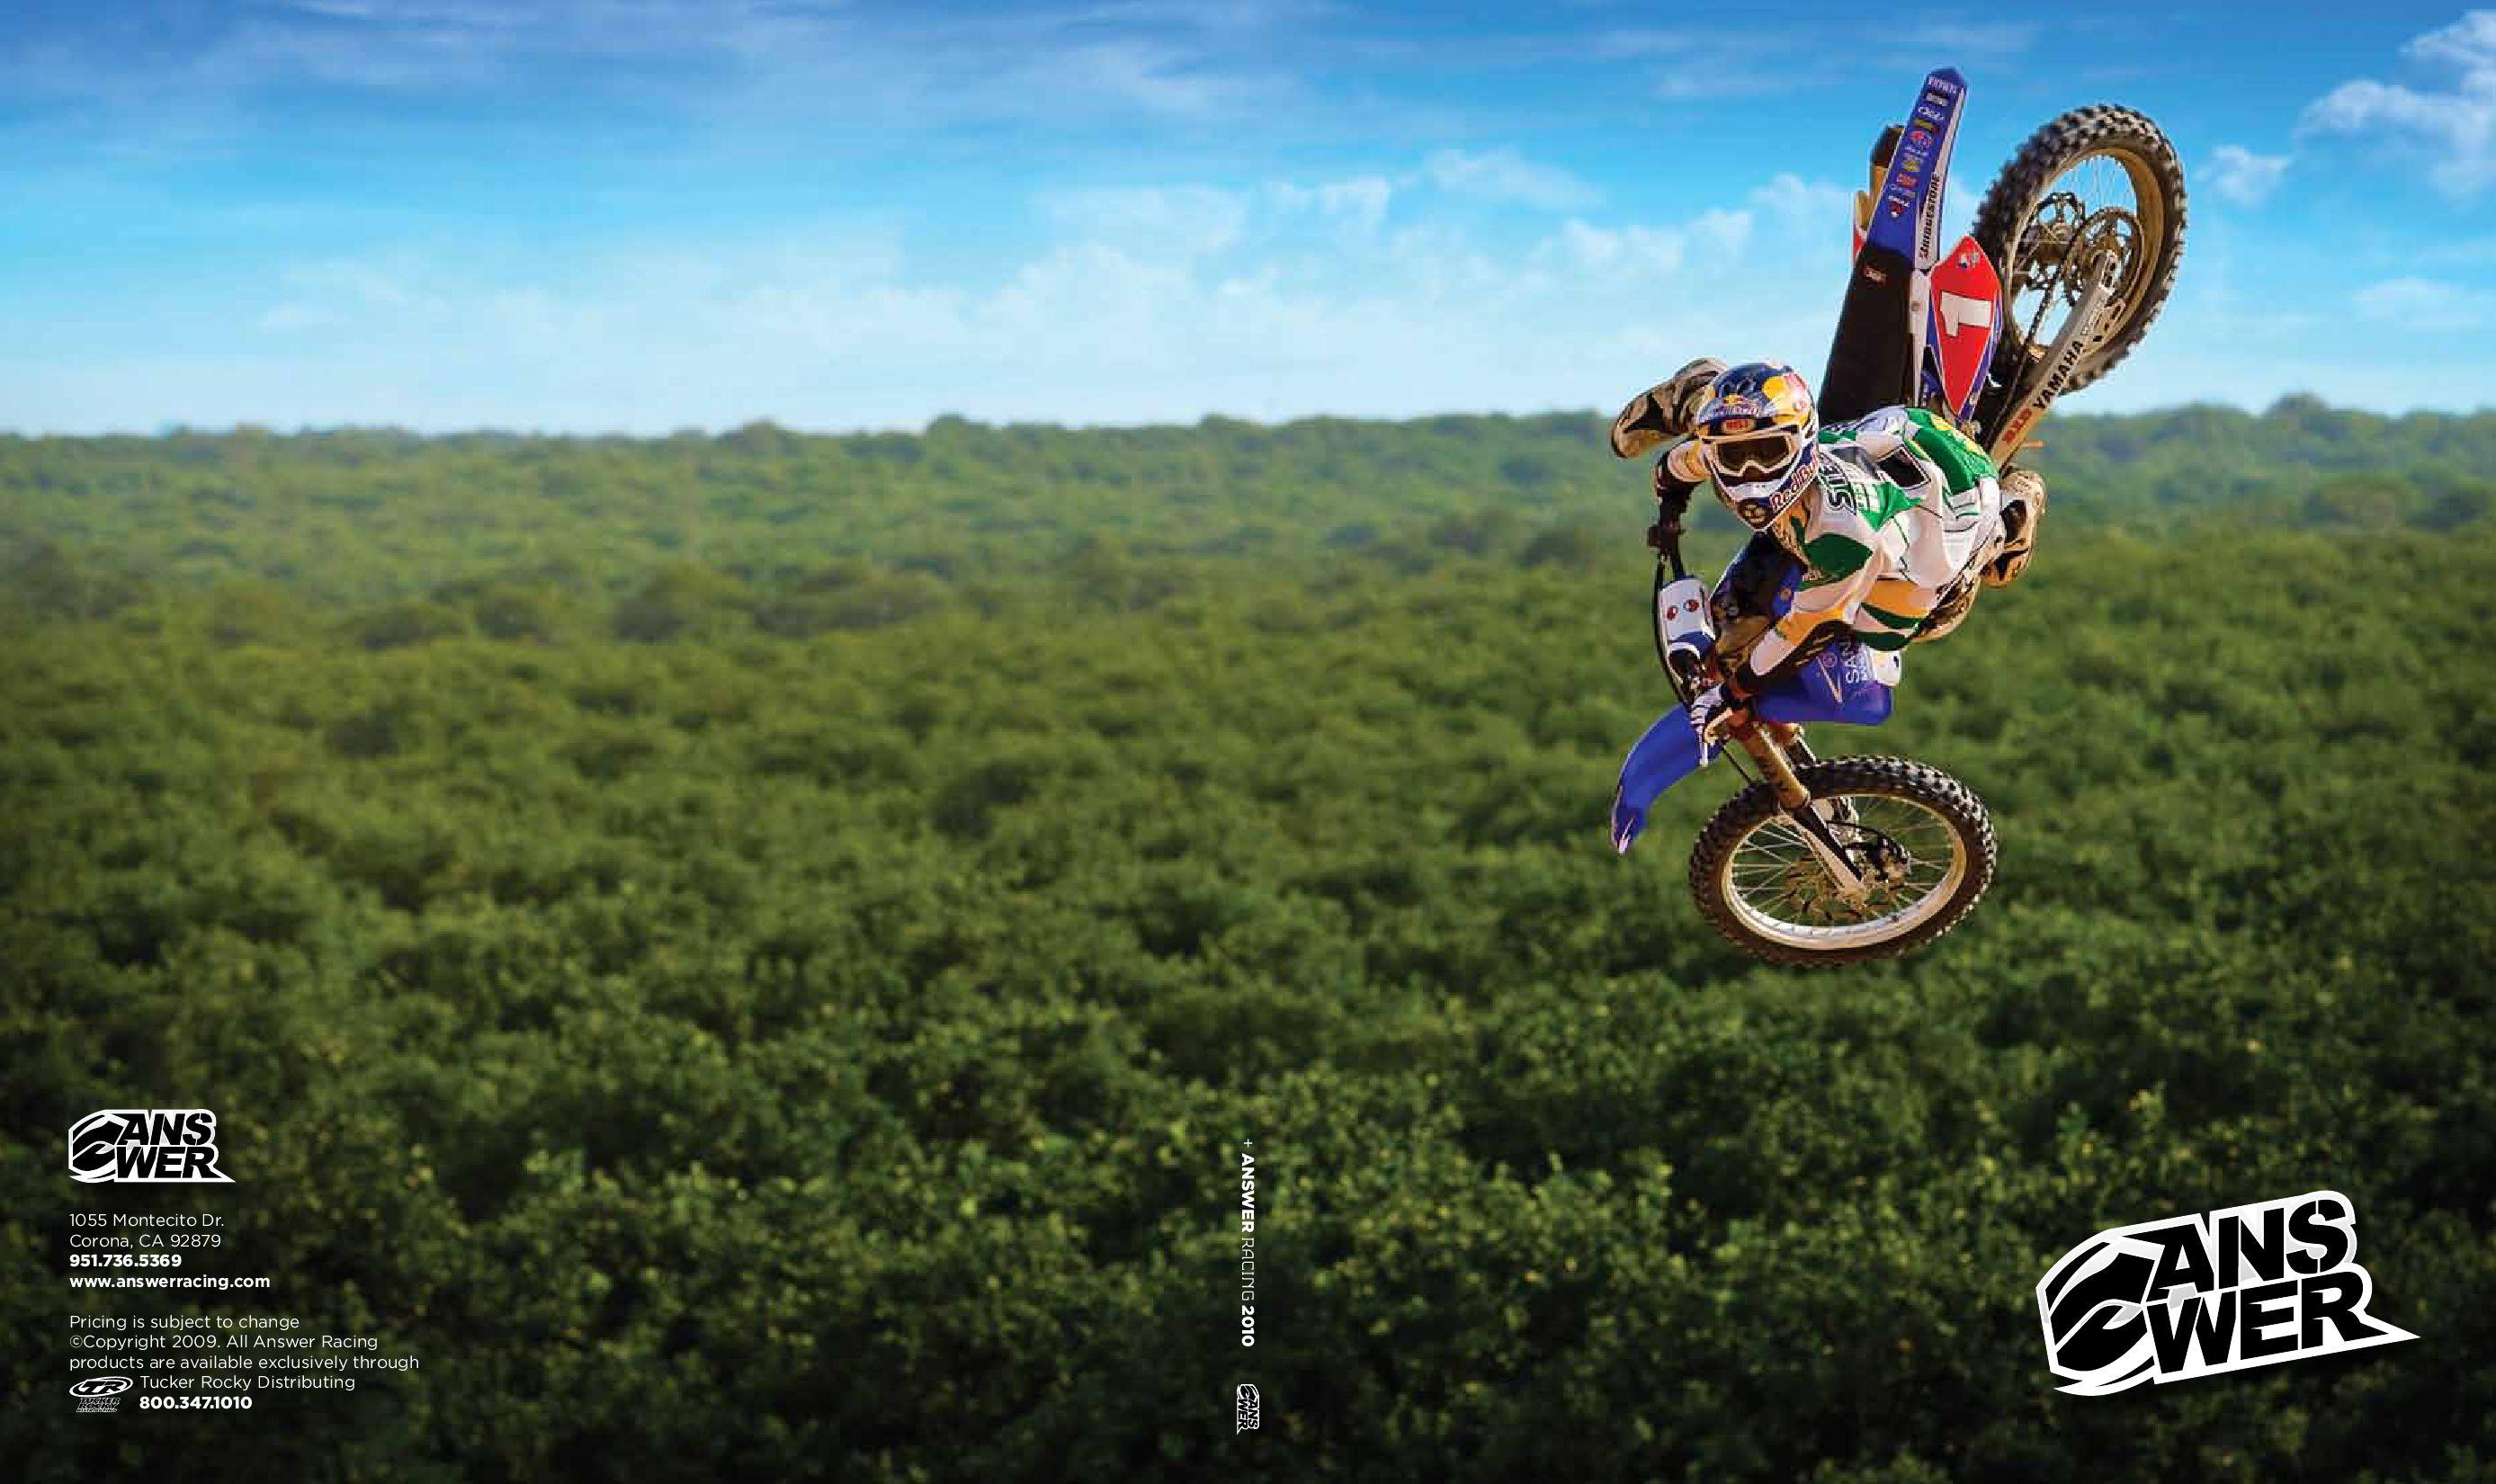 ANSWER SYNC MX GLOVE DIRT BIKE ATV MOTOCROSS RED KIDS LG